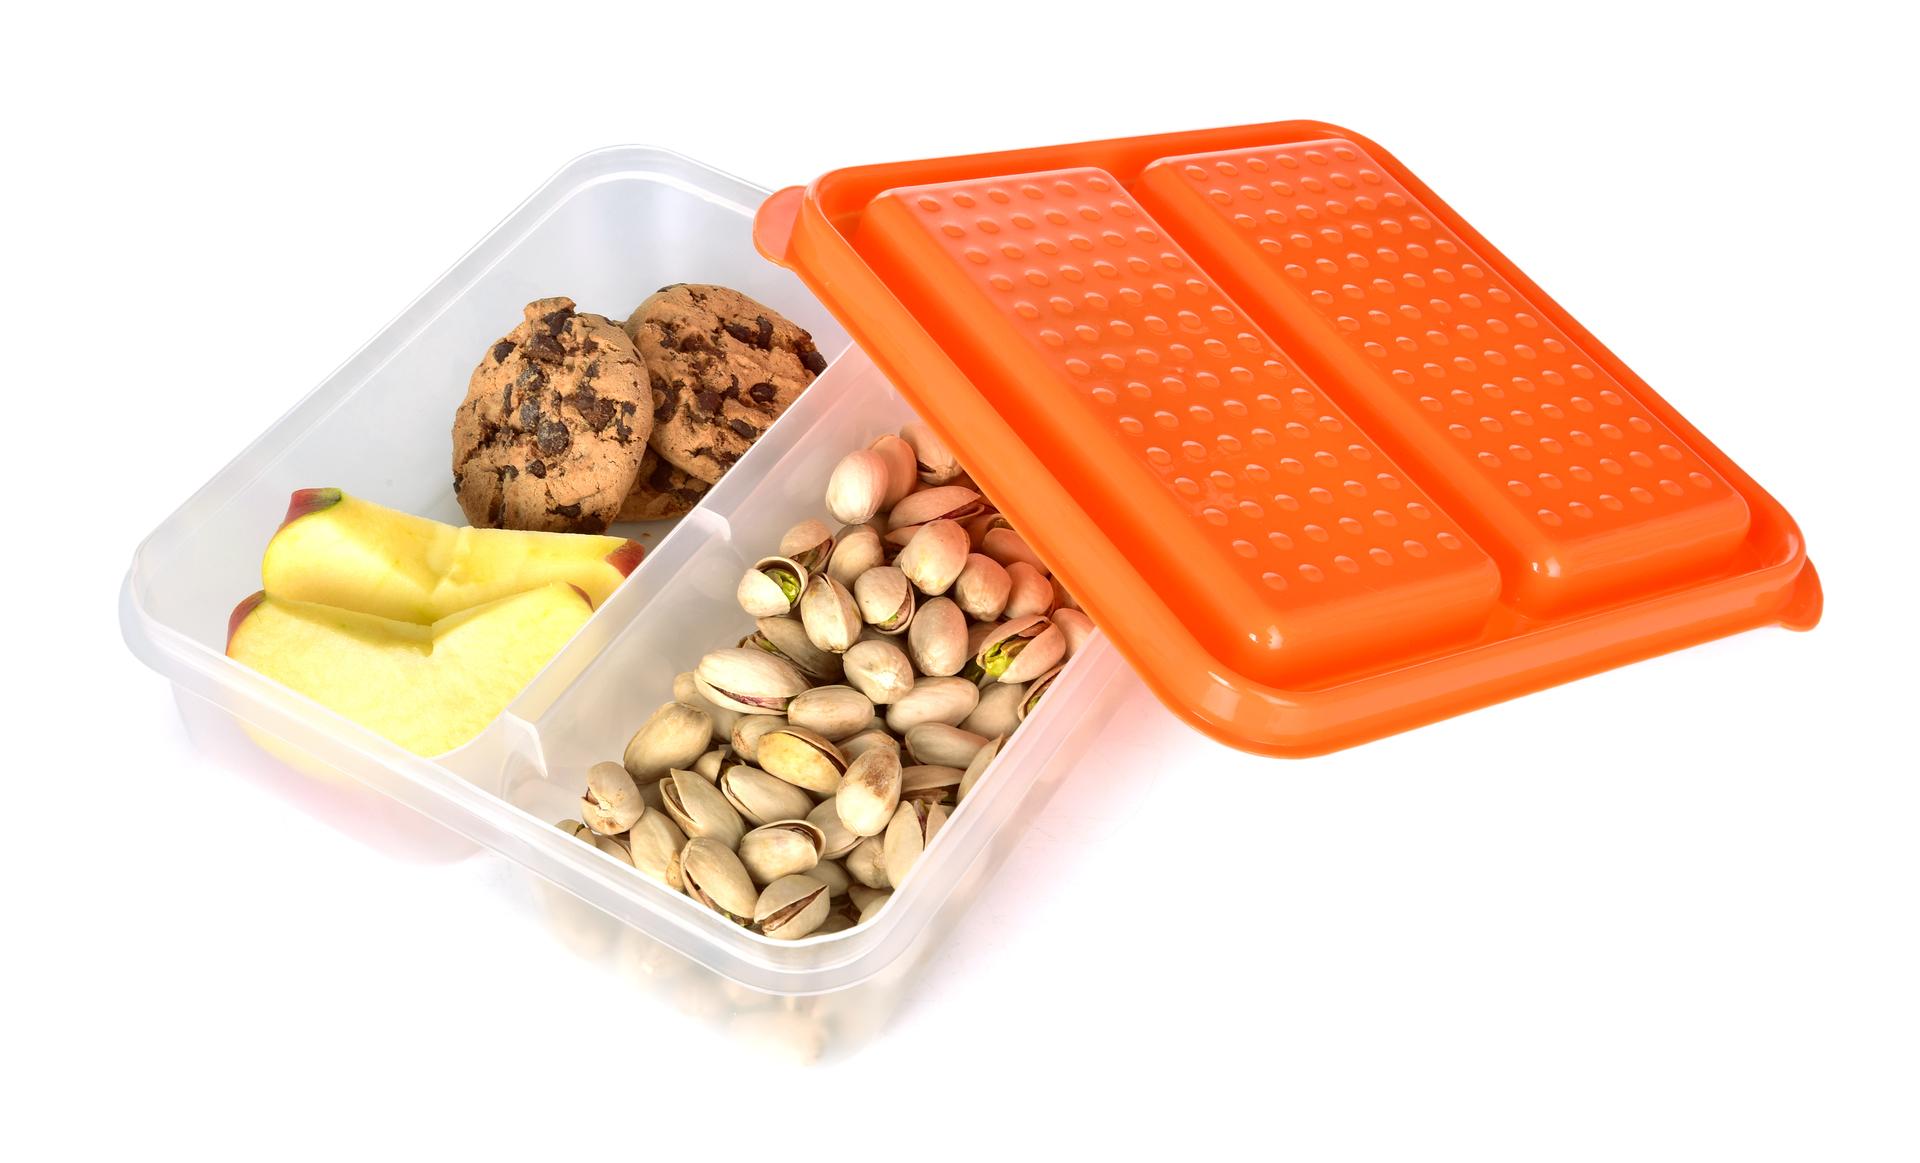 DA94044-DUOBOX 2in 1 500 + 500 ml dóza na potraviny, oranžový